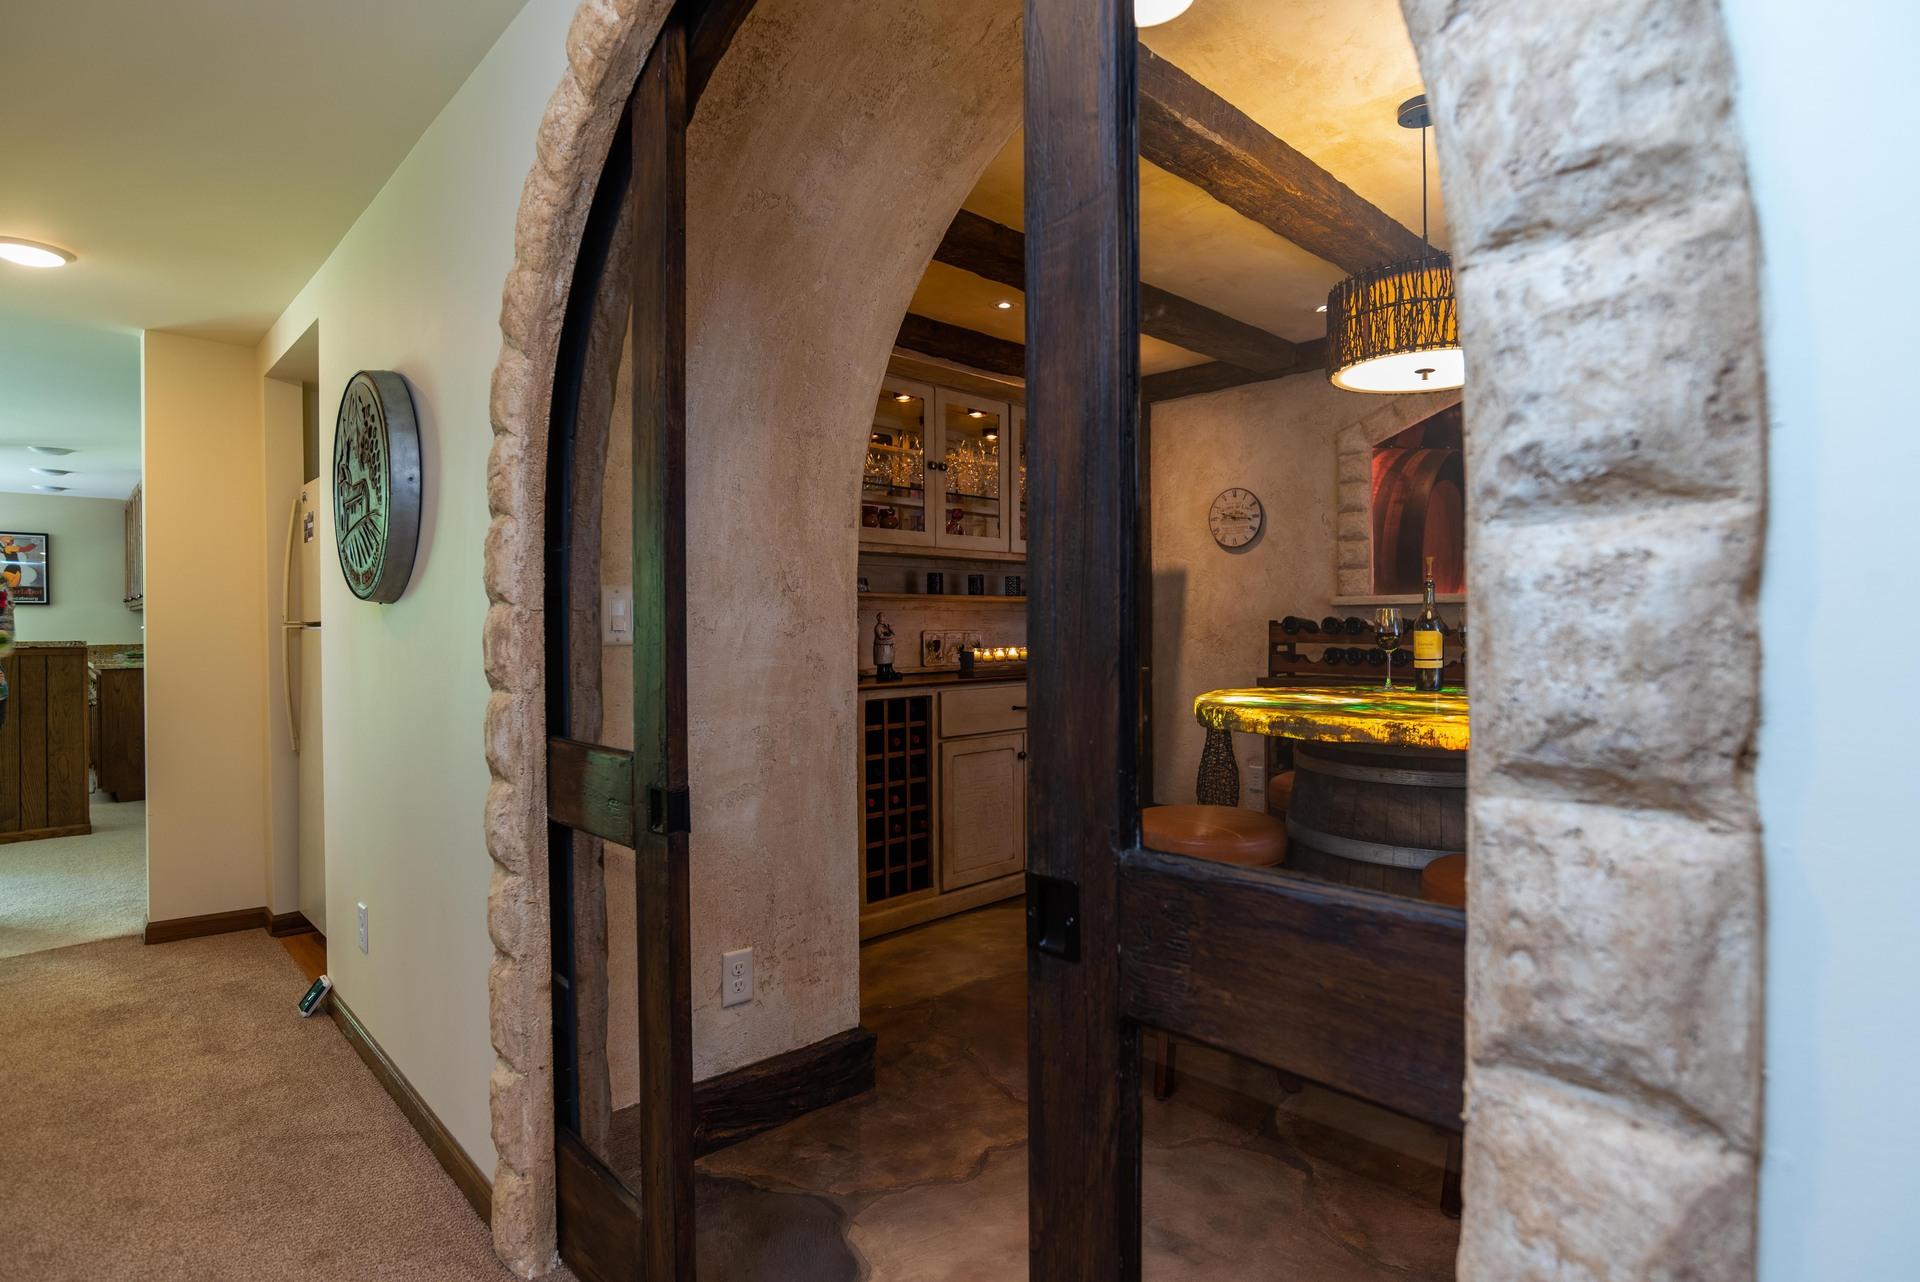 Custom flooring designed by Granicrete Minnesota for this spacious wine tasting room.  Photographer: John Walsh